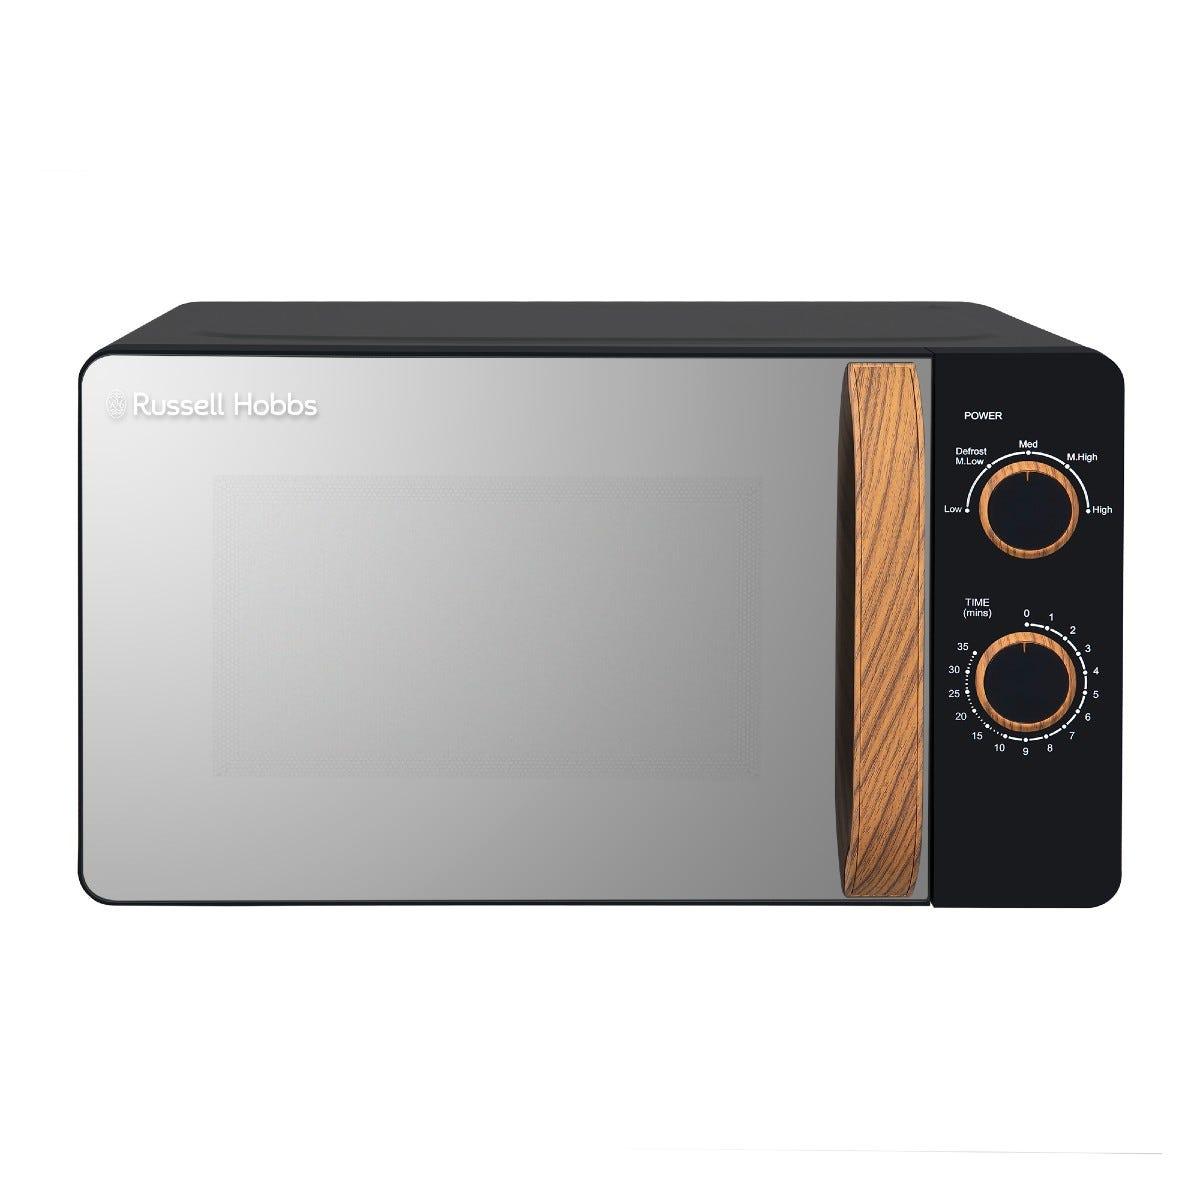 Russell Hobbs RHMM713B-N Scandi 17L 700W Manual Microwave - Black with Wooden Effect Handle